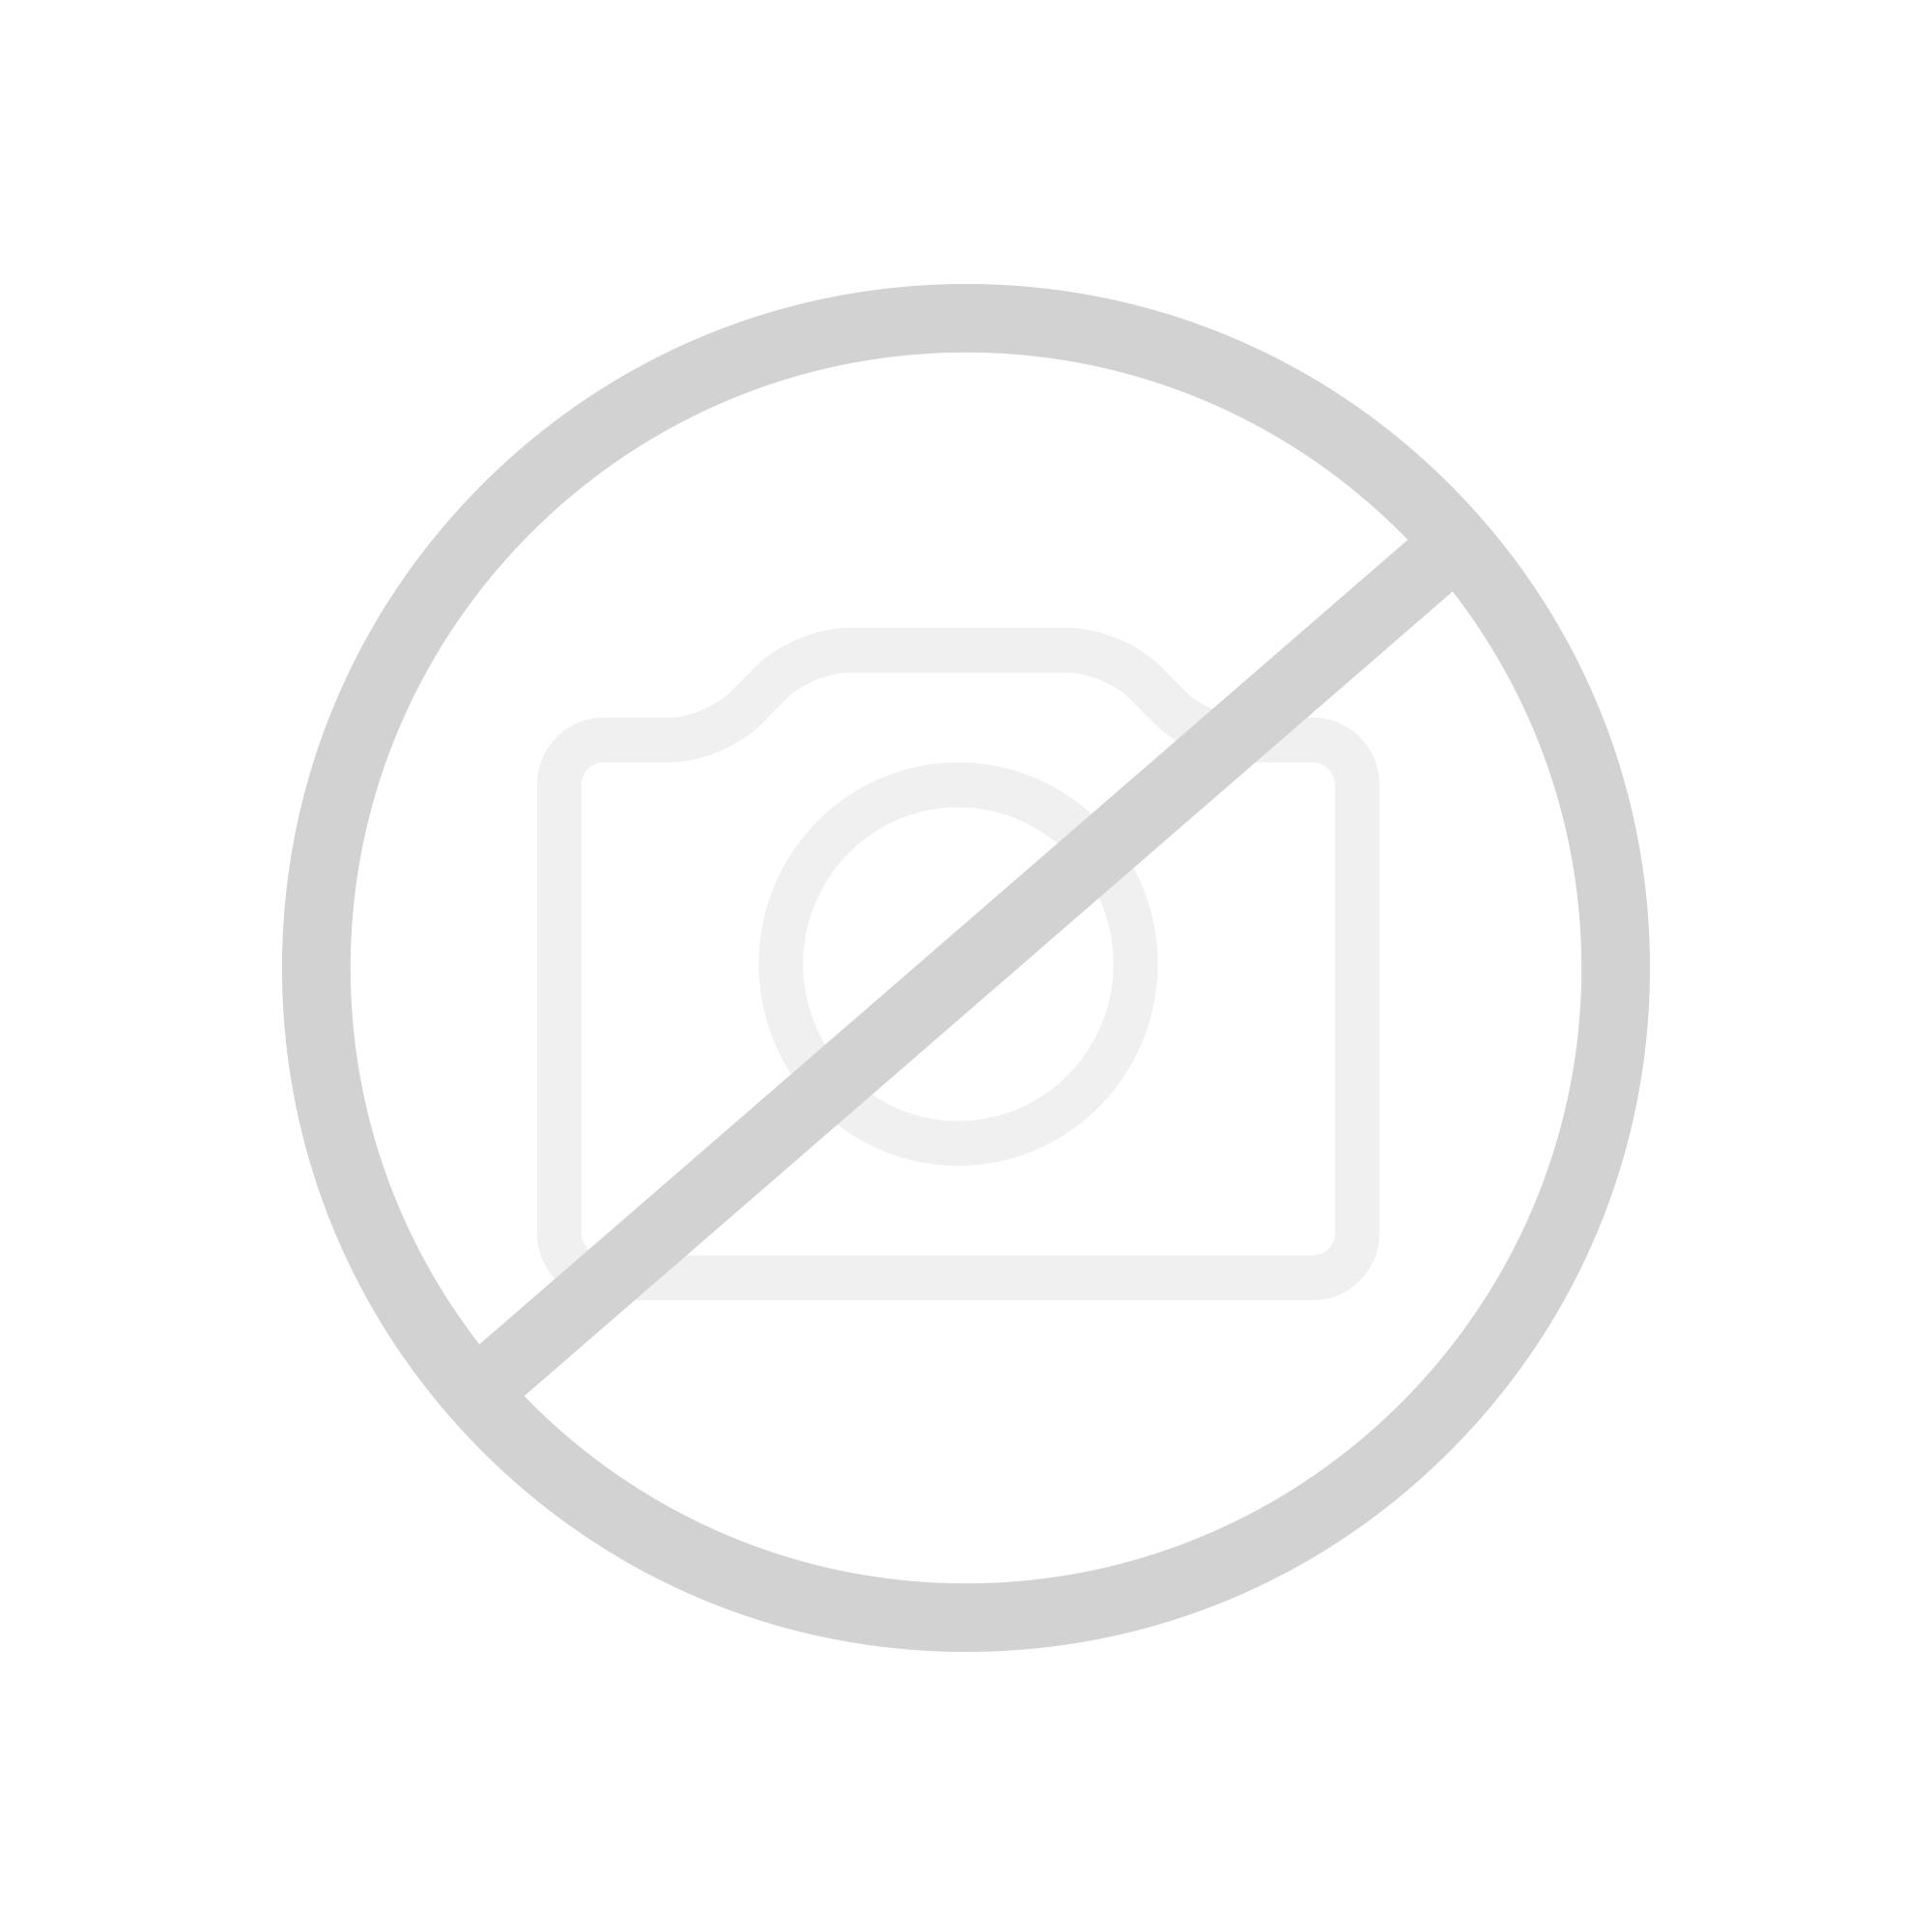 dornbracht madison madison flair seitenbrause messing 28518360 09 reuter onlineshop. Black Bedroom Furniture Sets. Home Design Ideas